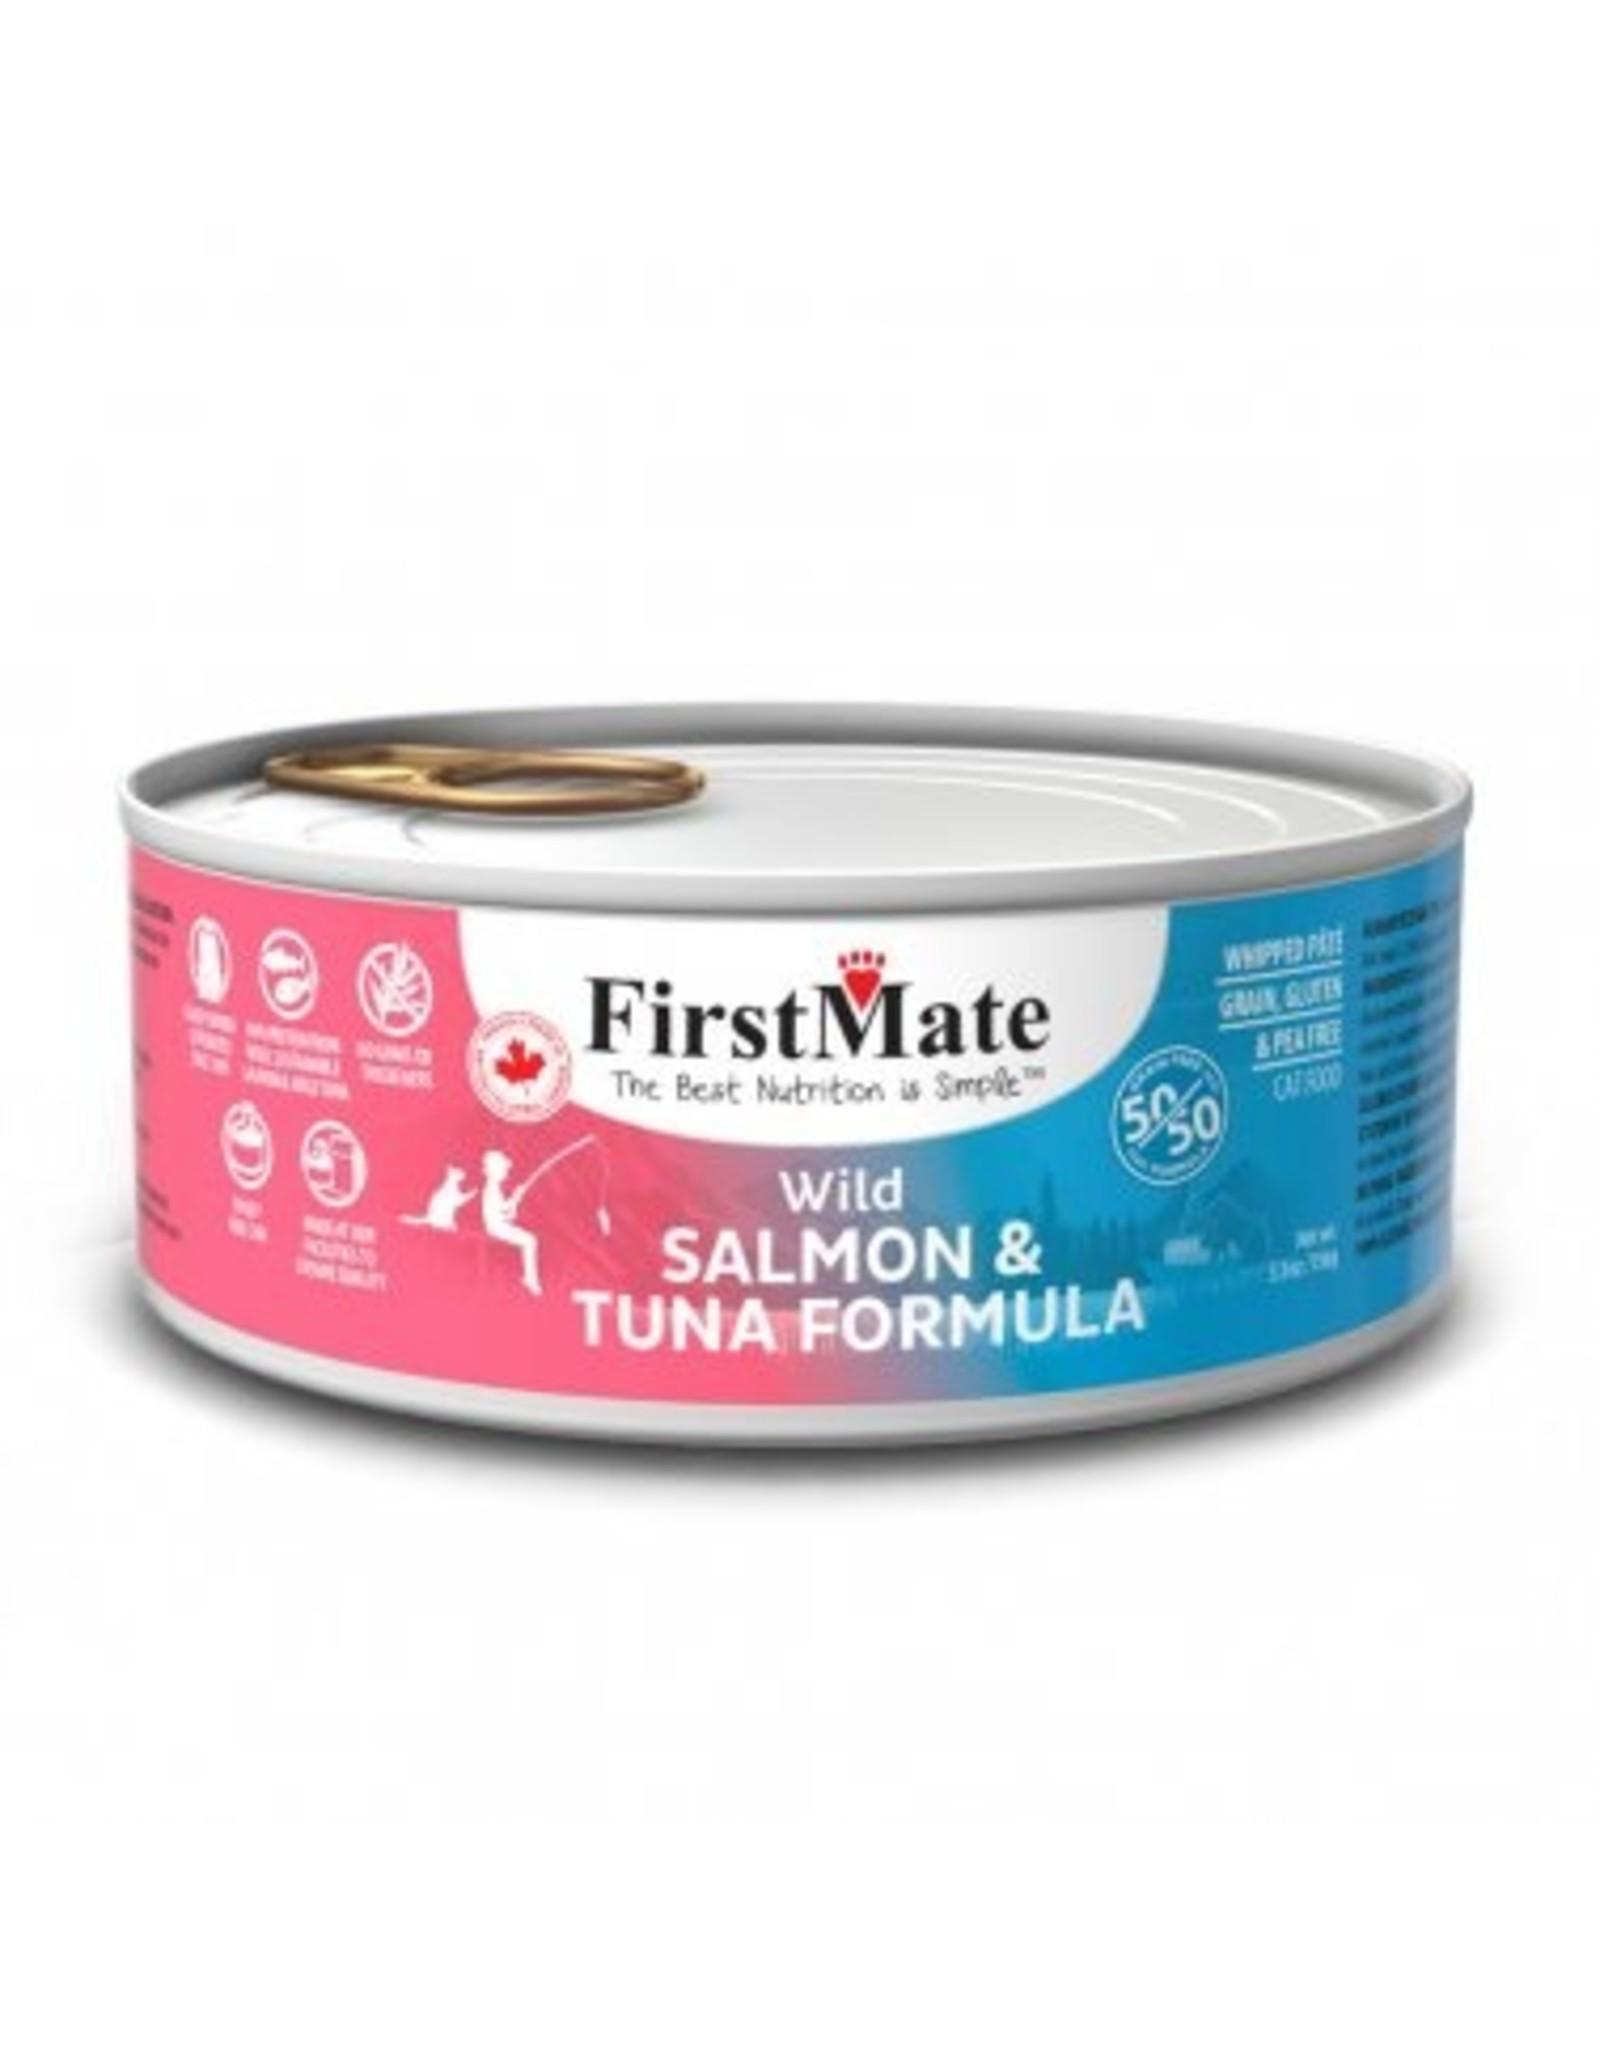 FirstMate FIRSTMATE CAT 50/50 SALMON TUNA 5.5OZ